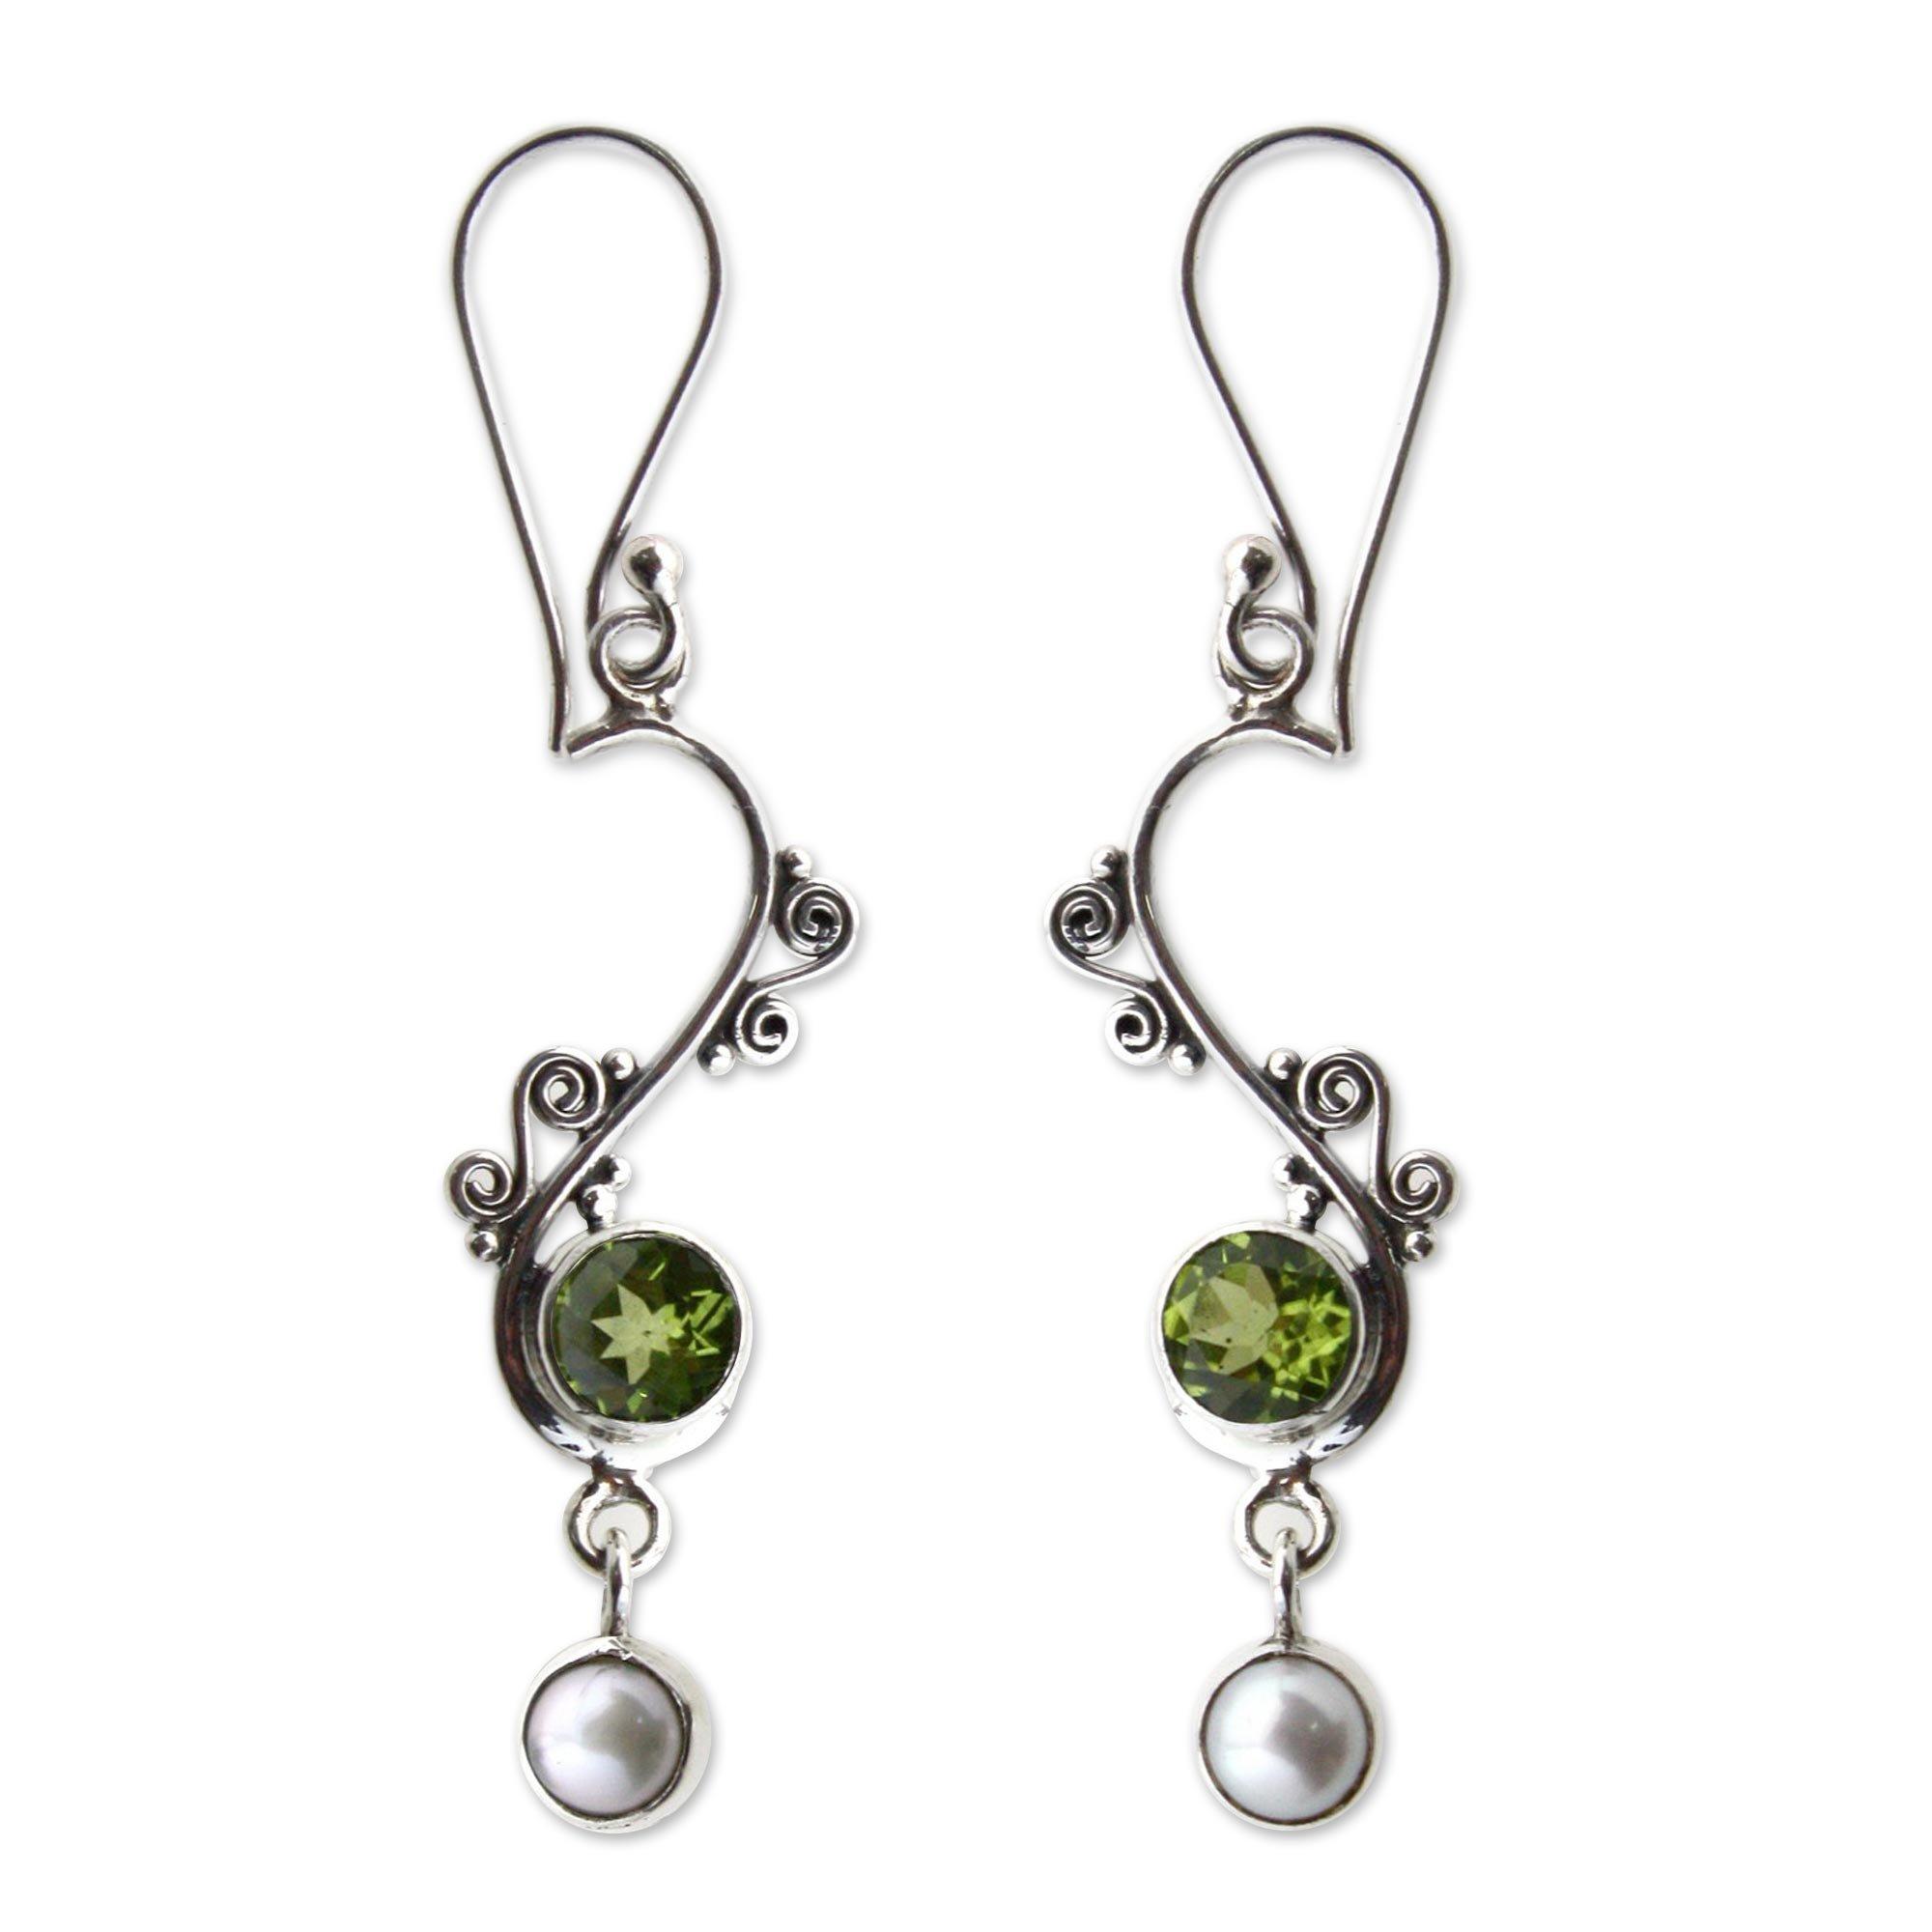 NOVICA Peridot White Cultured Freshwater Pearl .925 Sterling Silver Dangle Earrings 'Graceful'